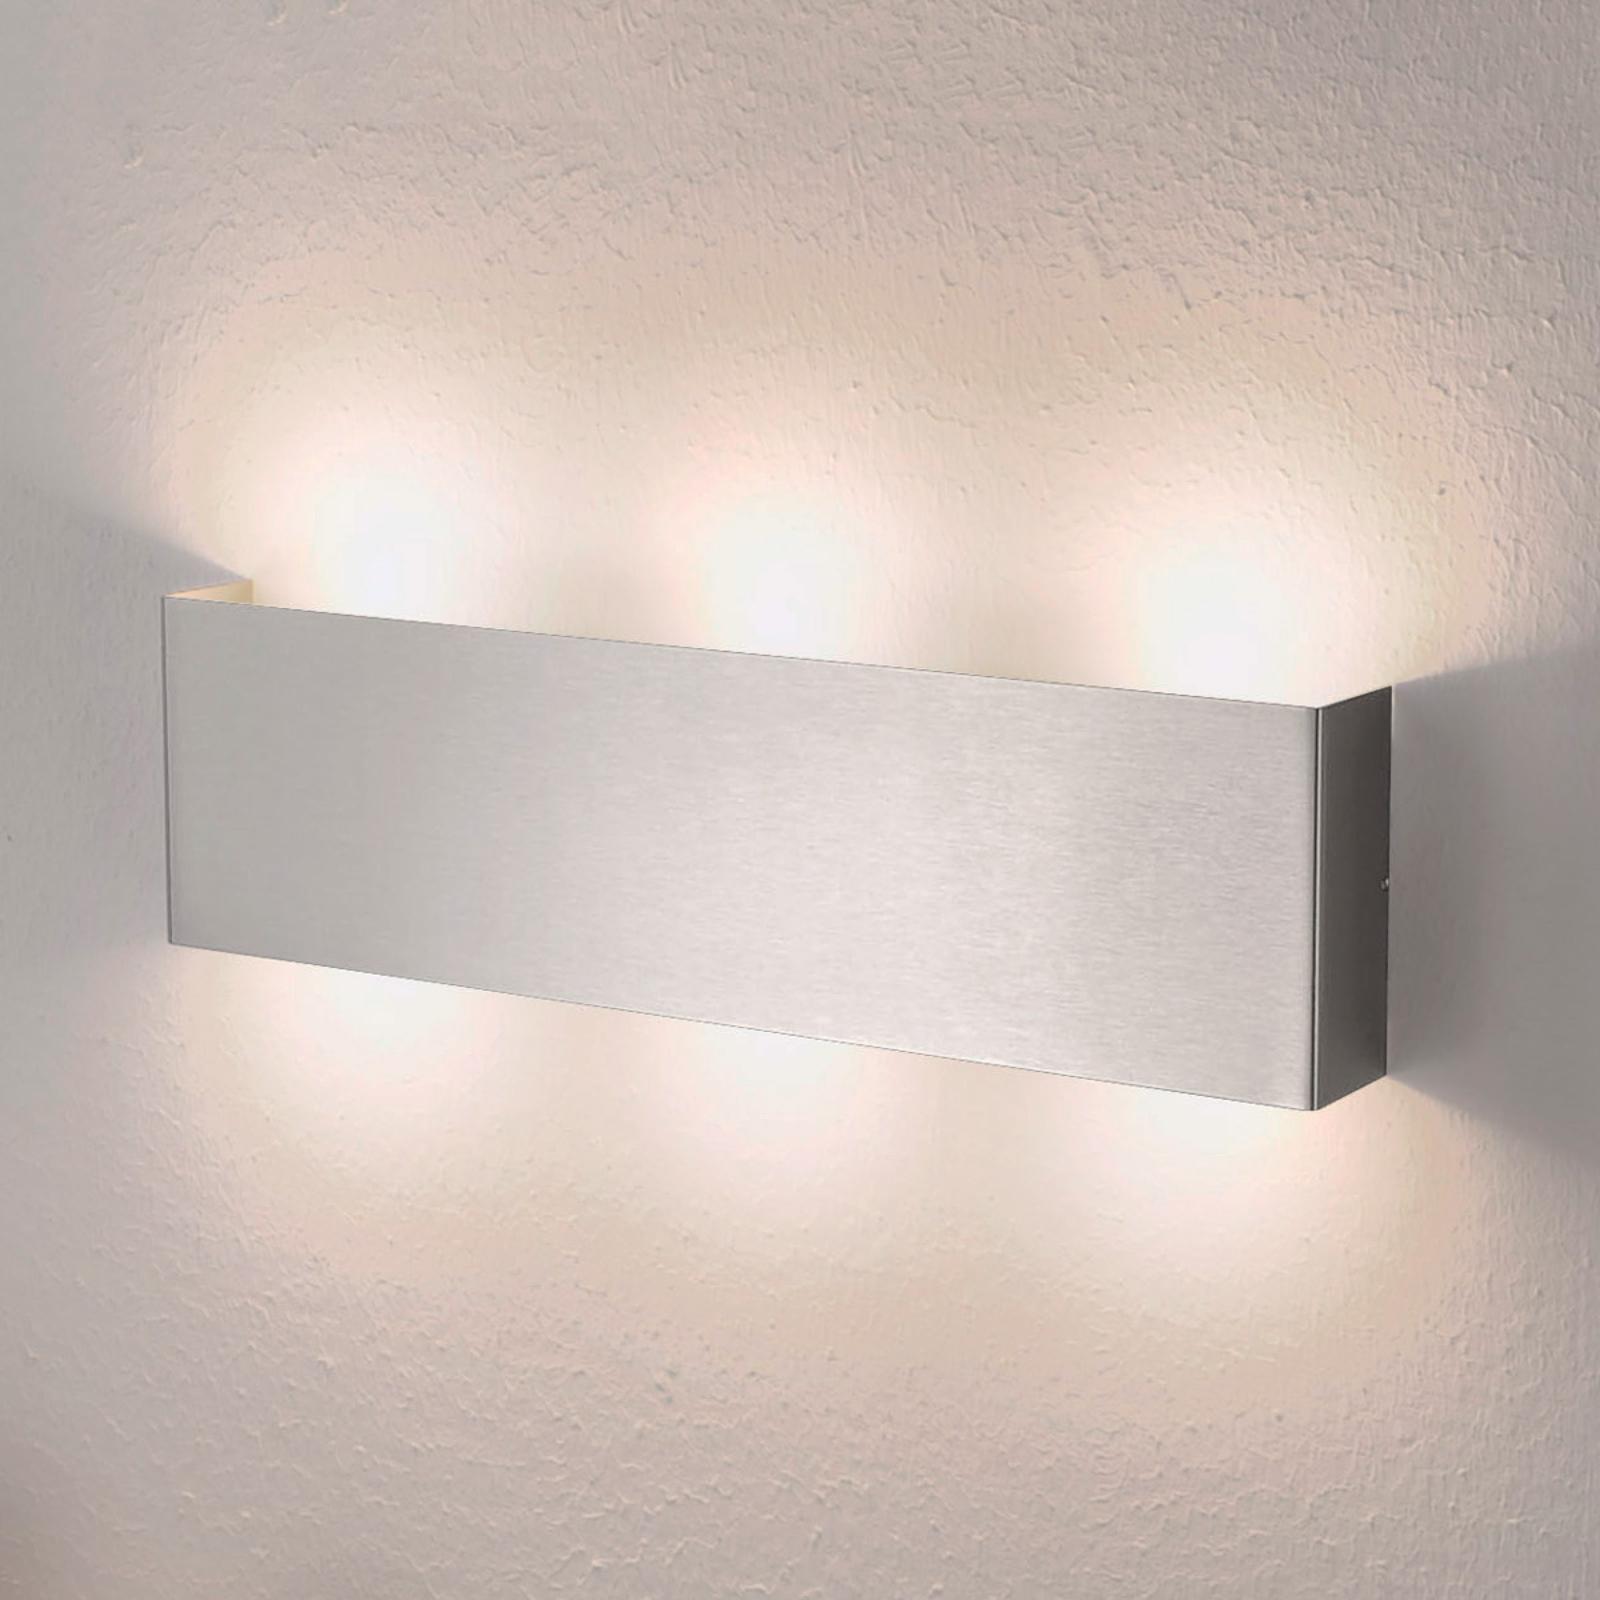 Acquista Lampada da parete a LED rettangolare Maja, 38 cm